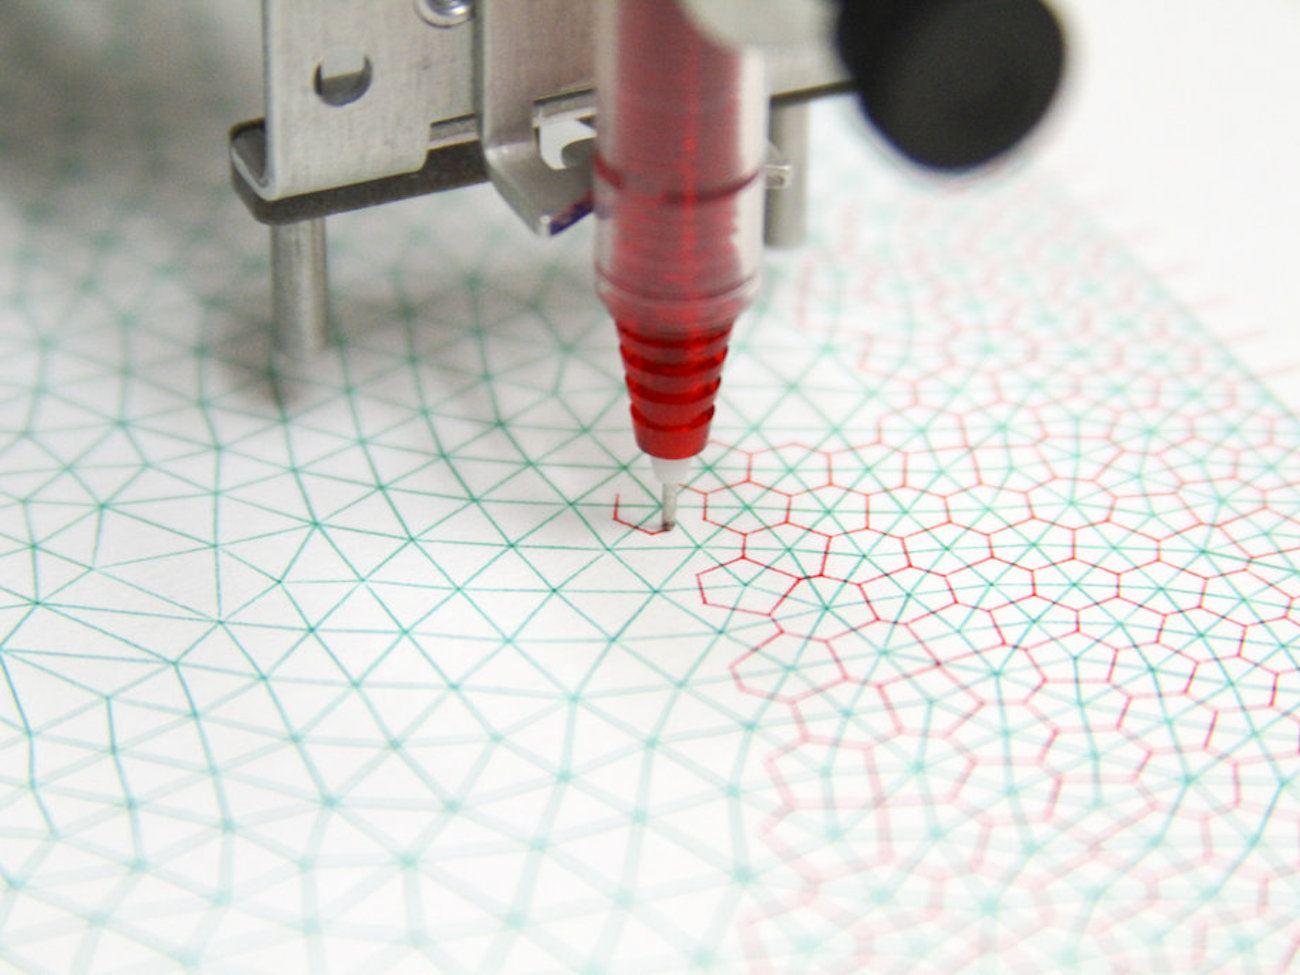 AxiDraw V3 Writing Drawing Machine